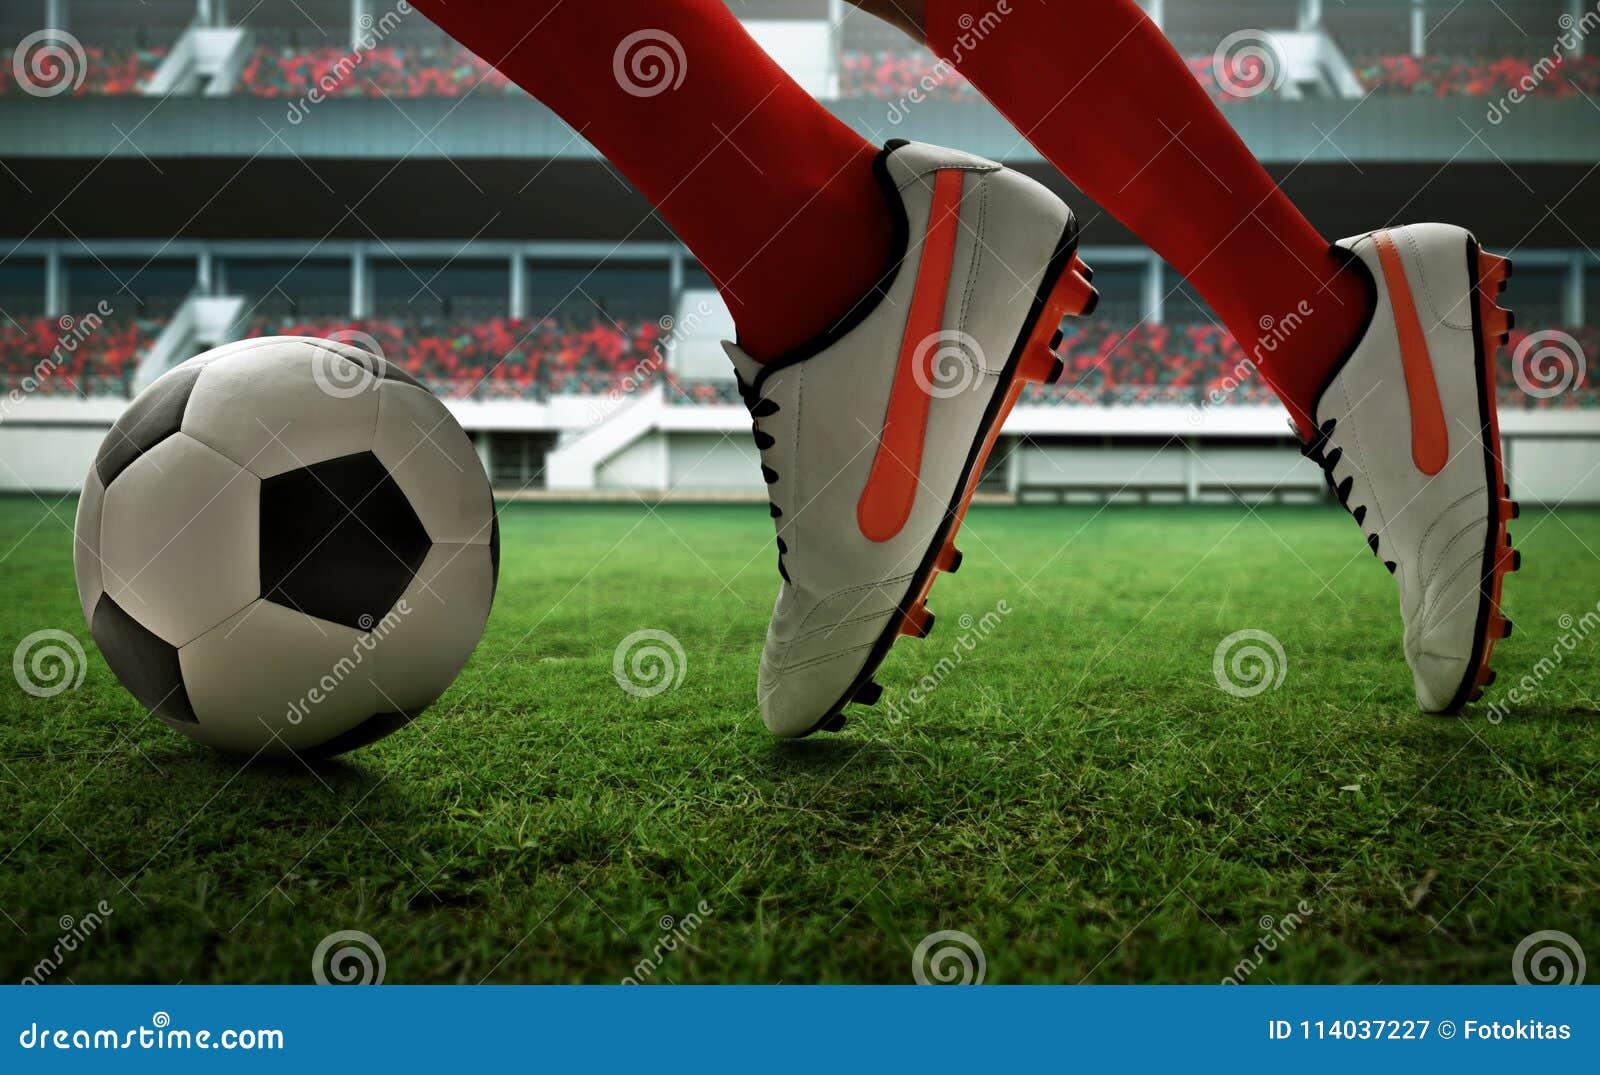 Футболист бежать на поле